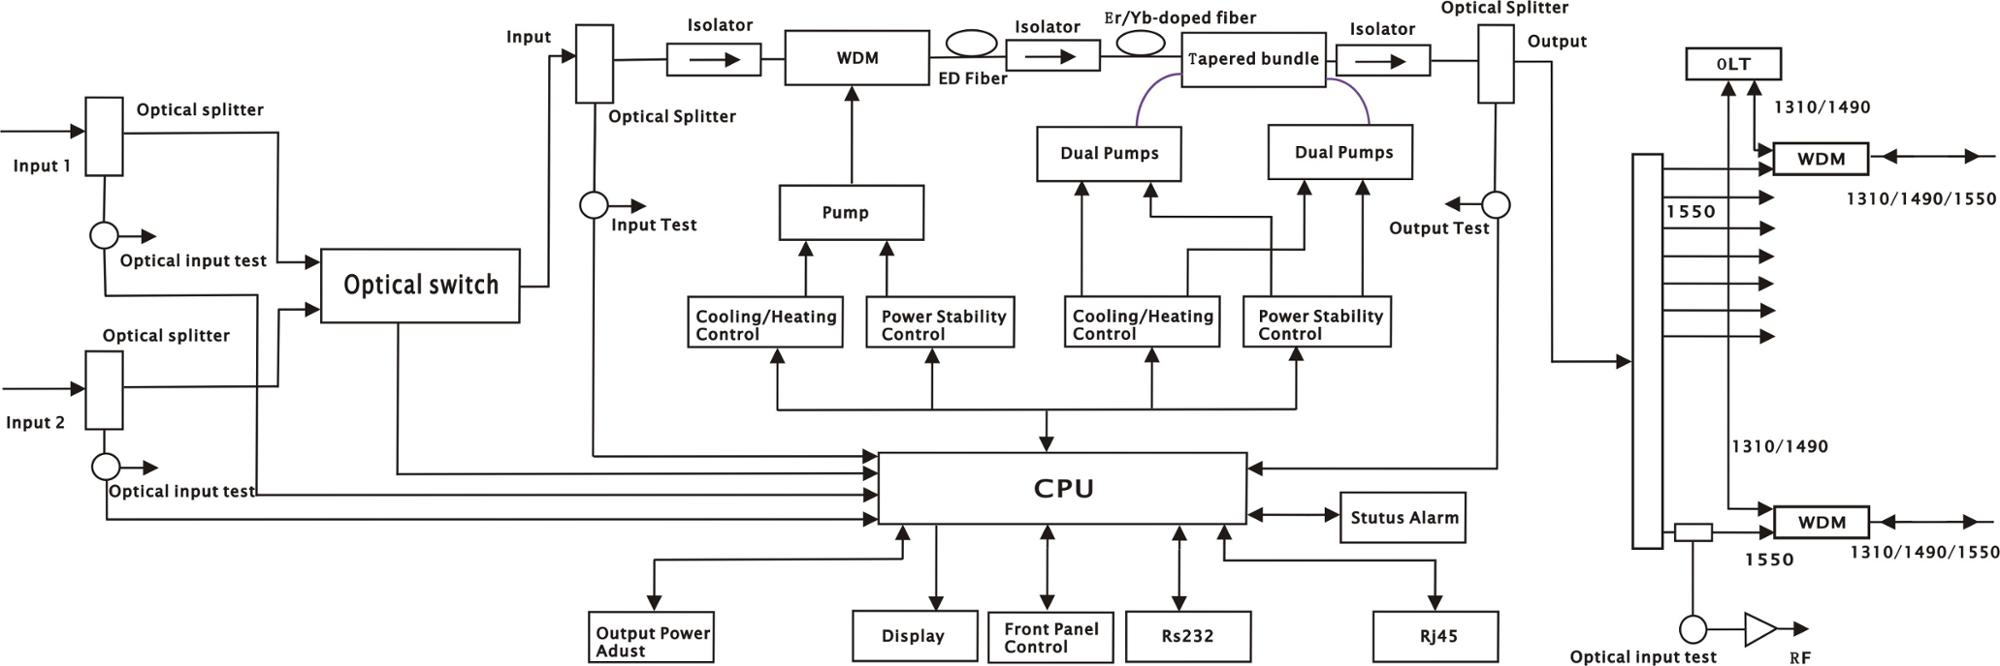 1550 EDFA Optical Amplifier application